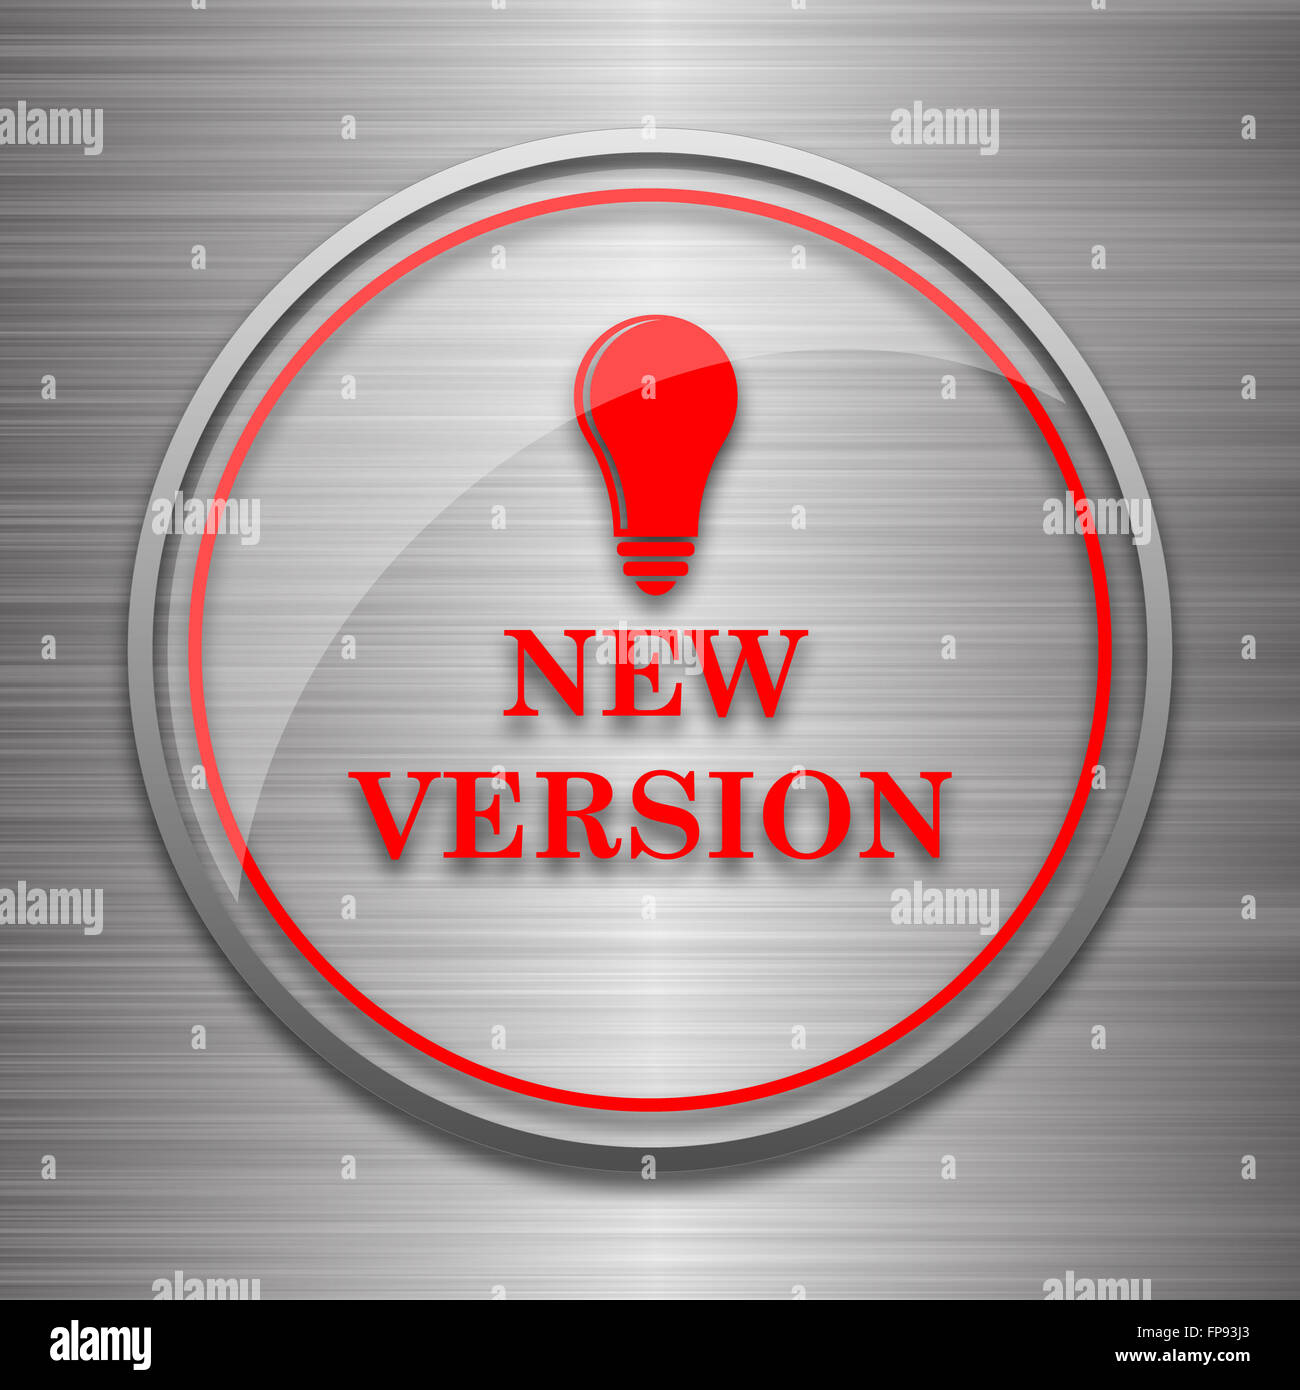 New version icon. Internet button on metallic background. - Stock Image